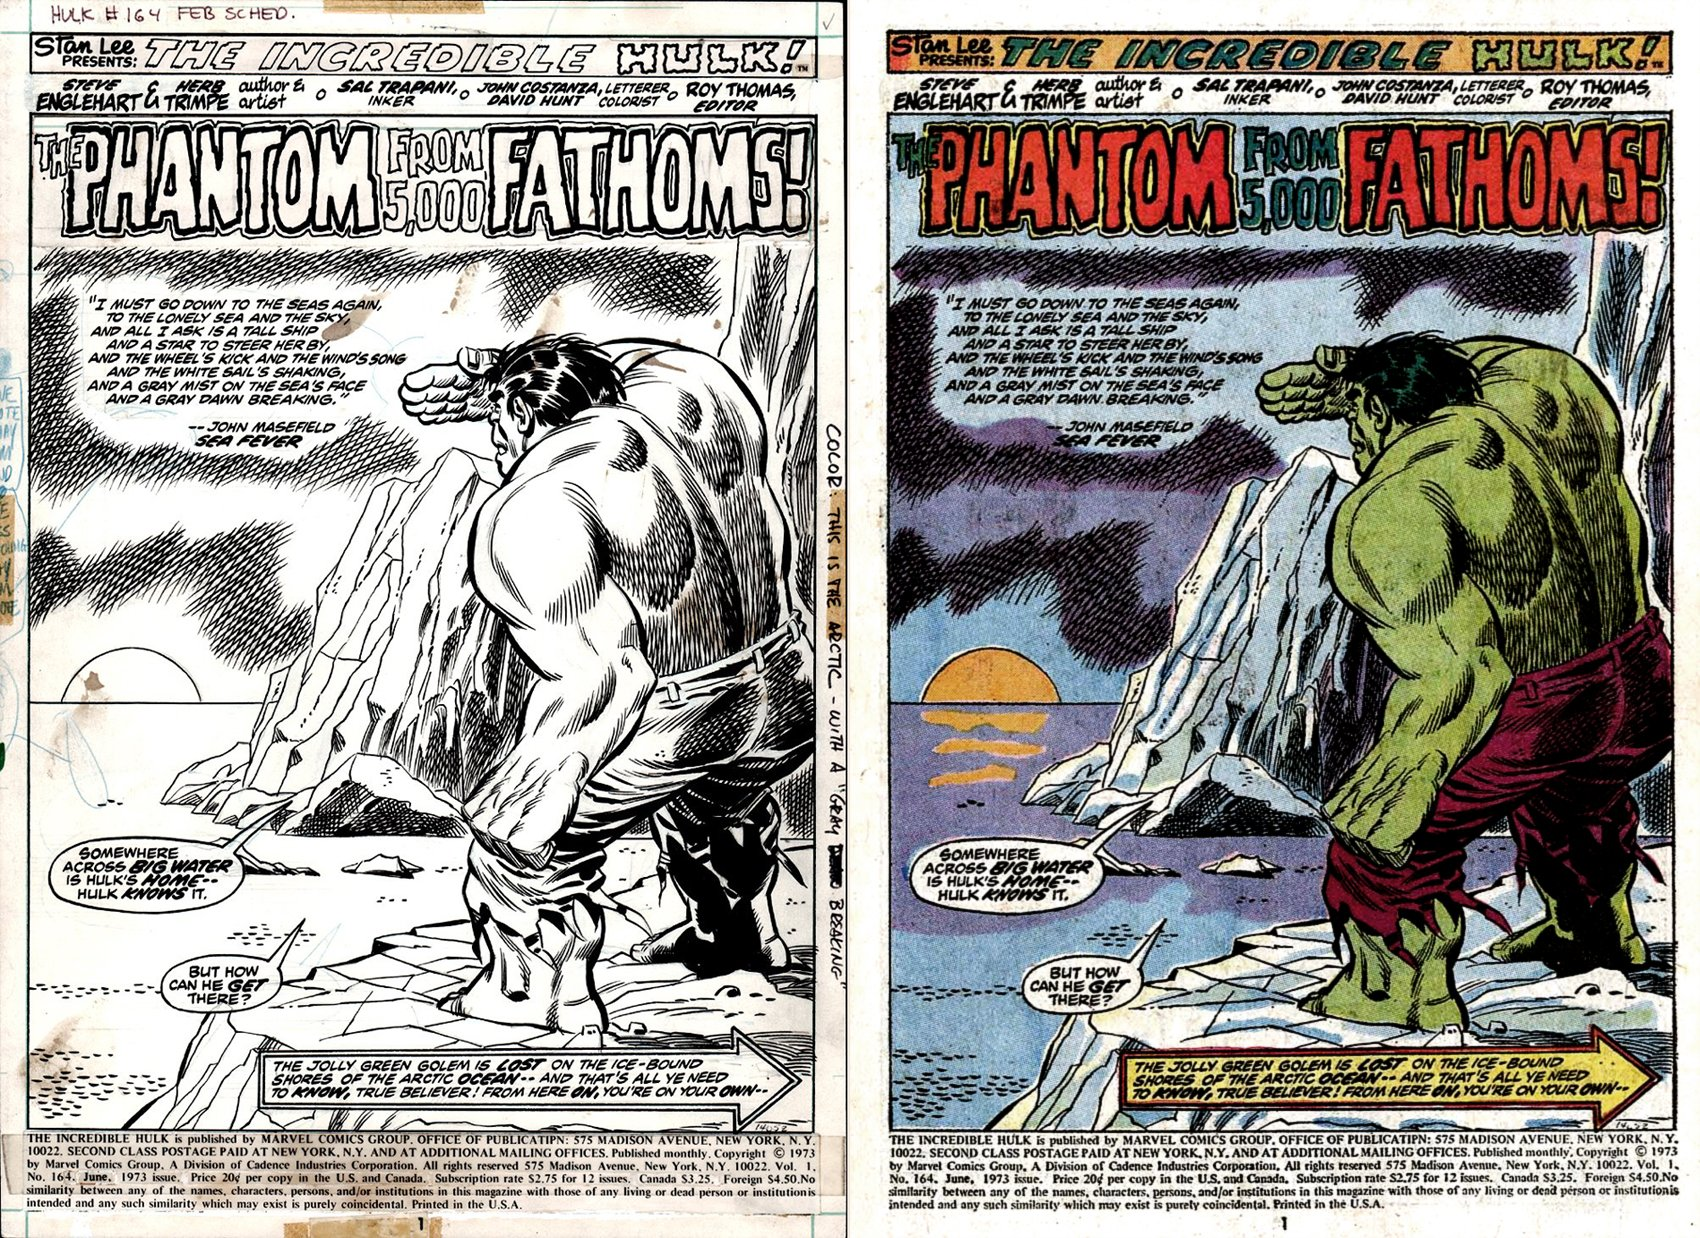 Incredible Hulk #164 p 1 HUGE HULK SPLASH (1973)